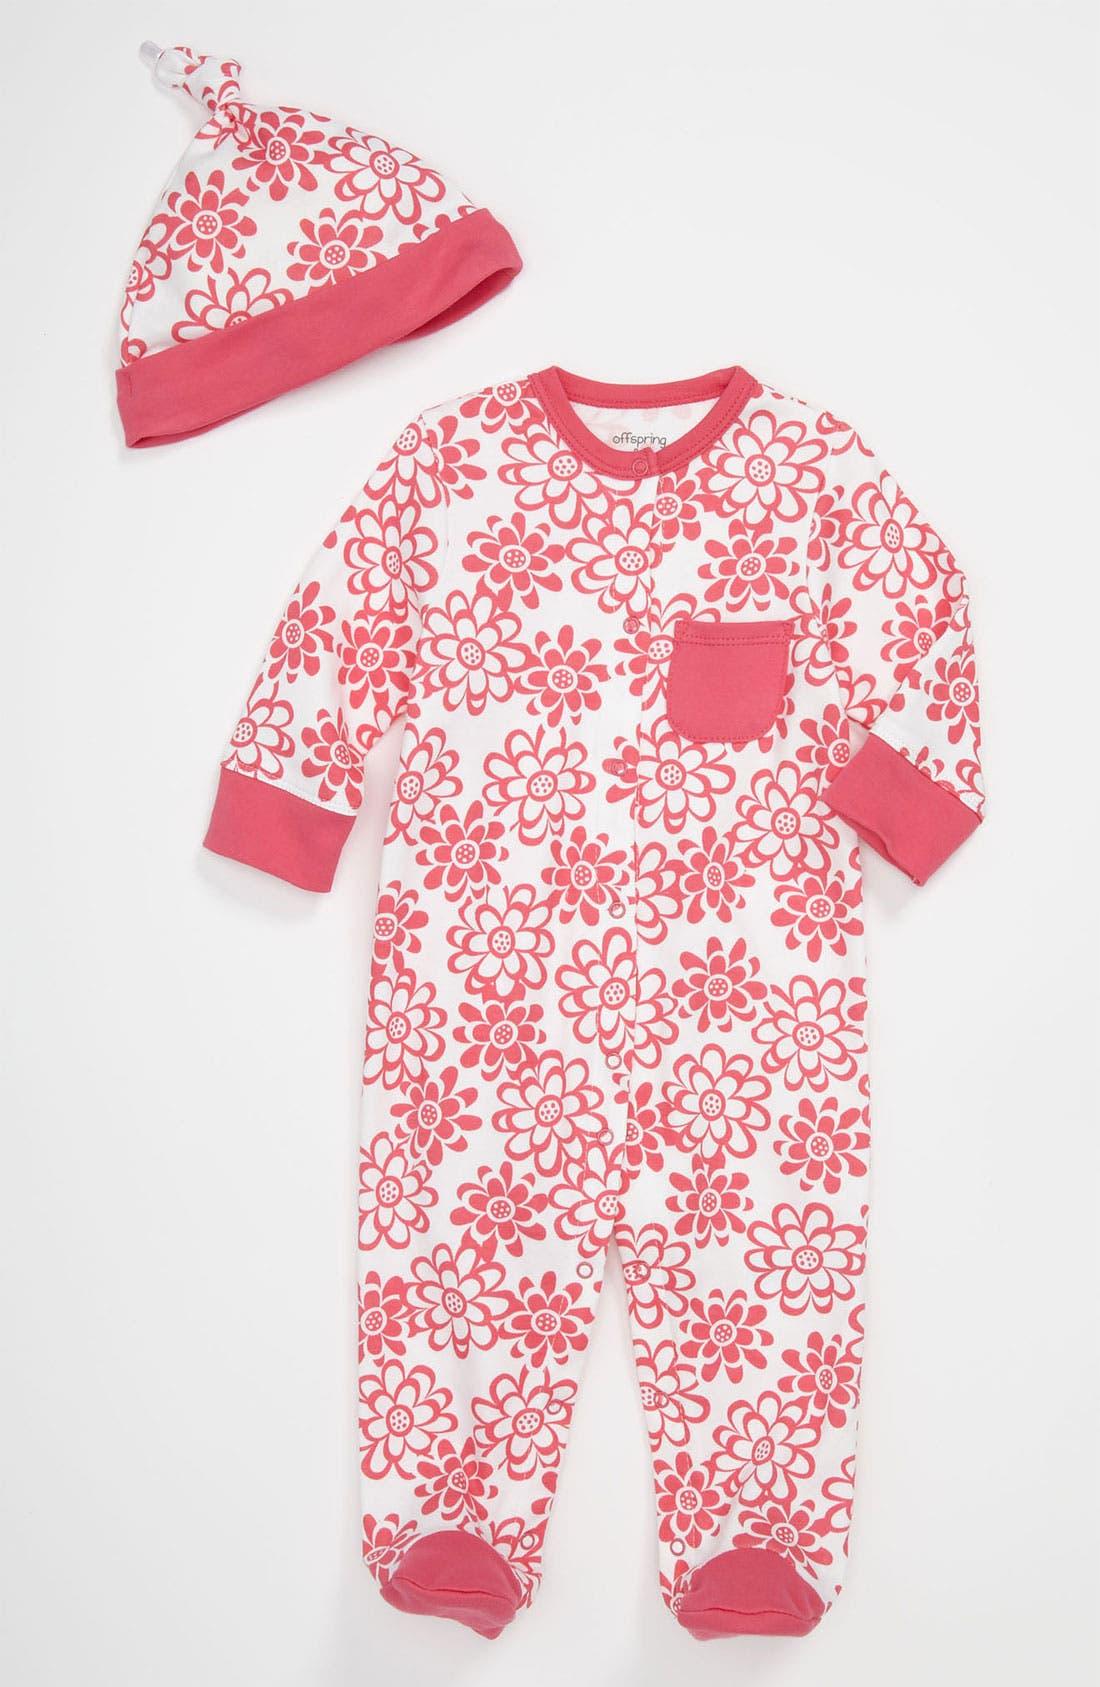 Main Image - Offspring 'Flower' Footie & Hat (Baby)